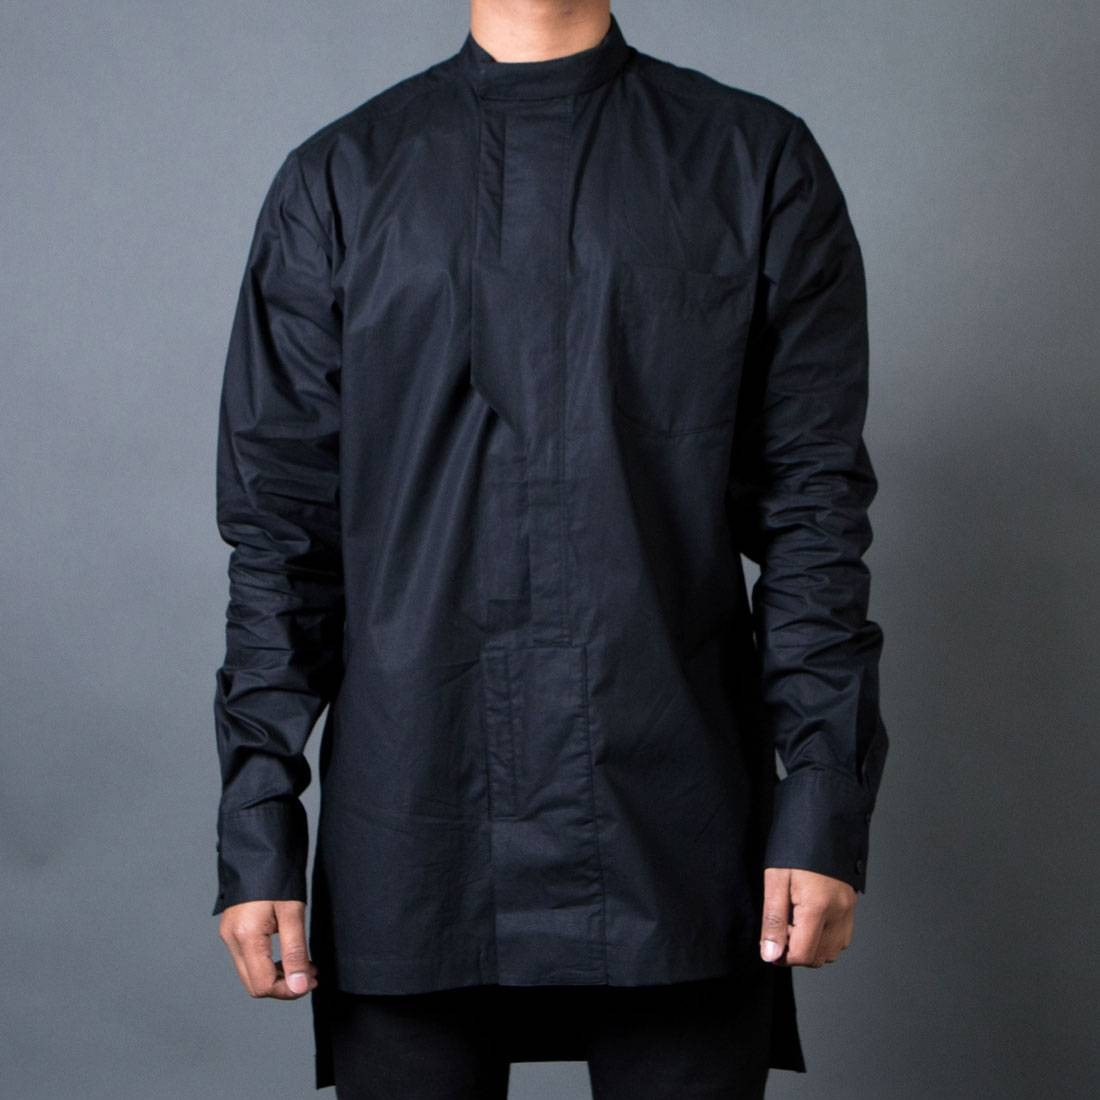 Adidas Y-3 Men Minimalist Shirt (black)